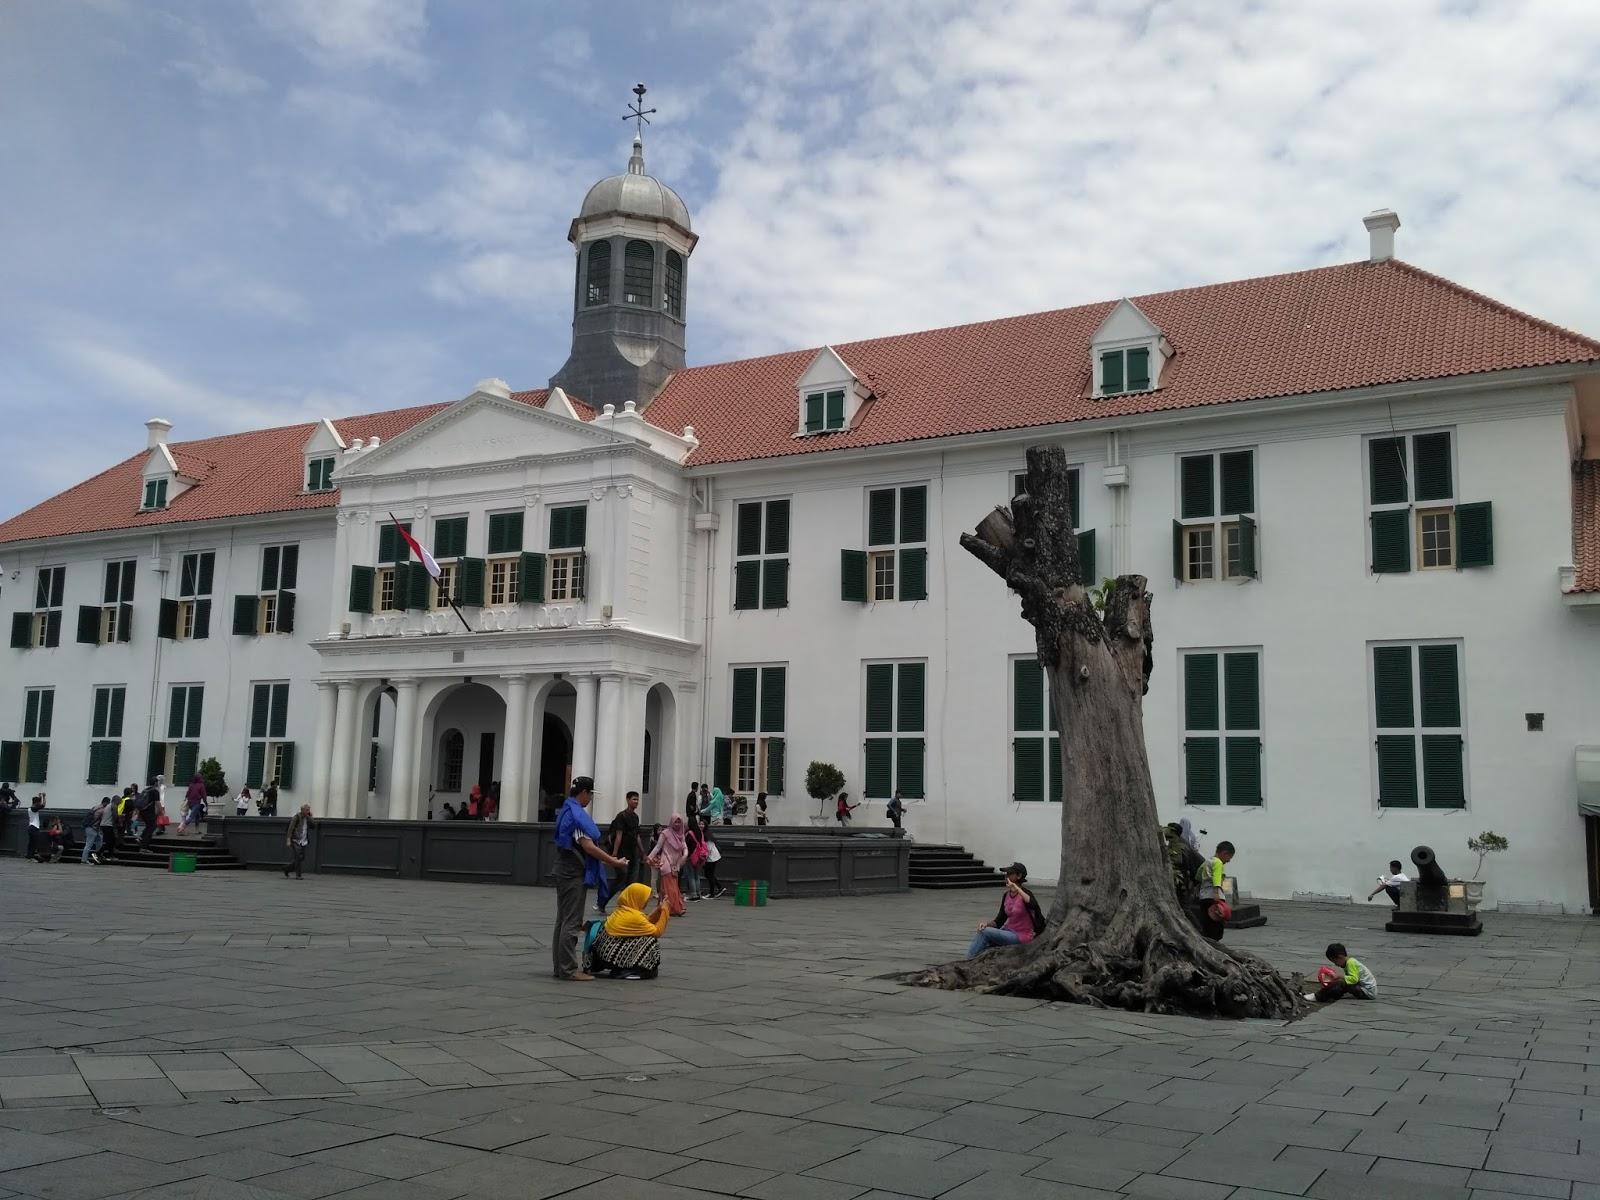 Kota Tua Pilihan Wisata Singkat Jakarta Museum Fatahillah Musium Administrasi